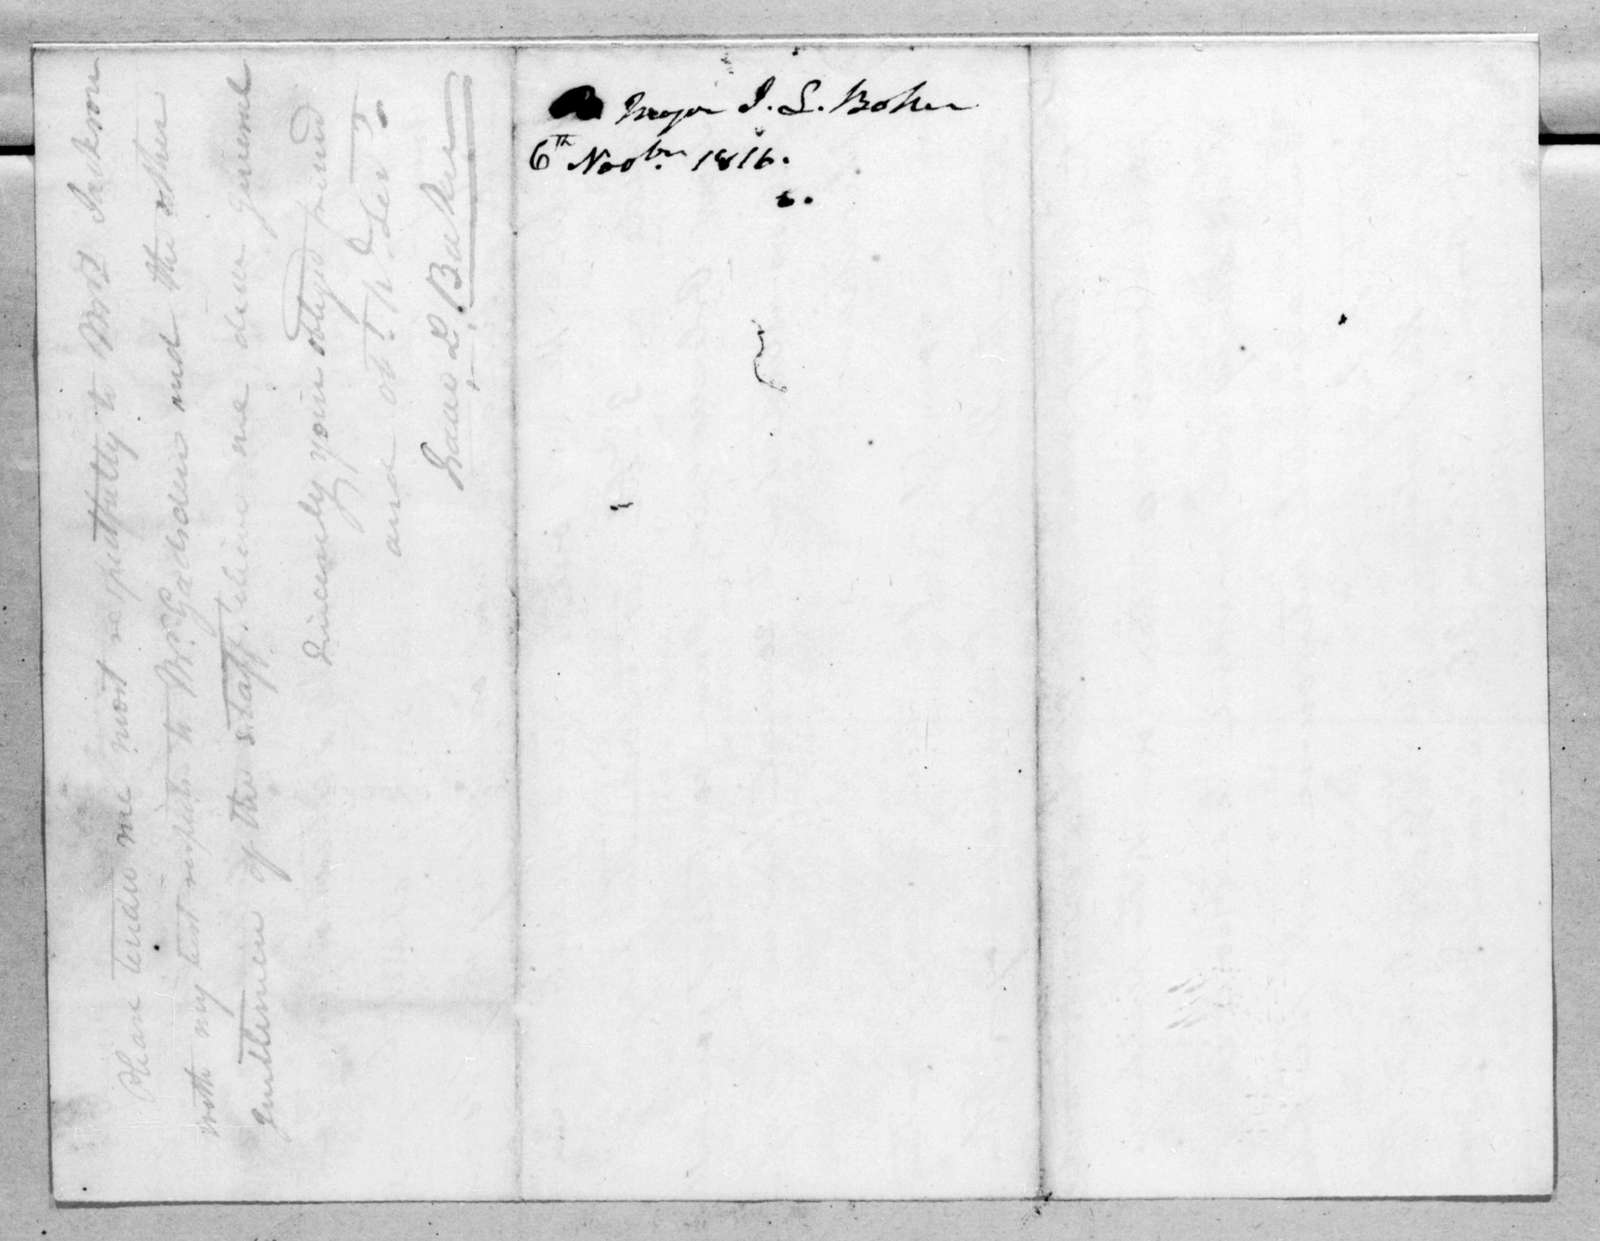 Isaac Lewis Baker to Andrew Jackson, November 6, 1816